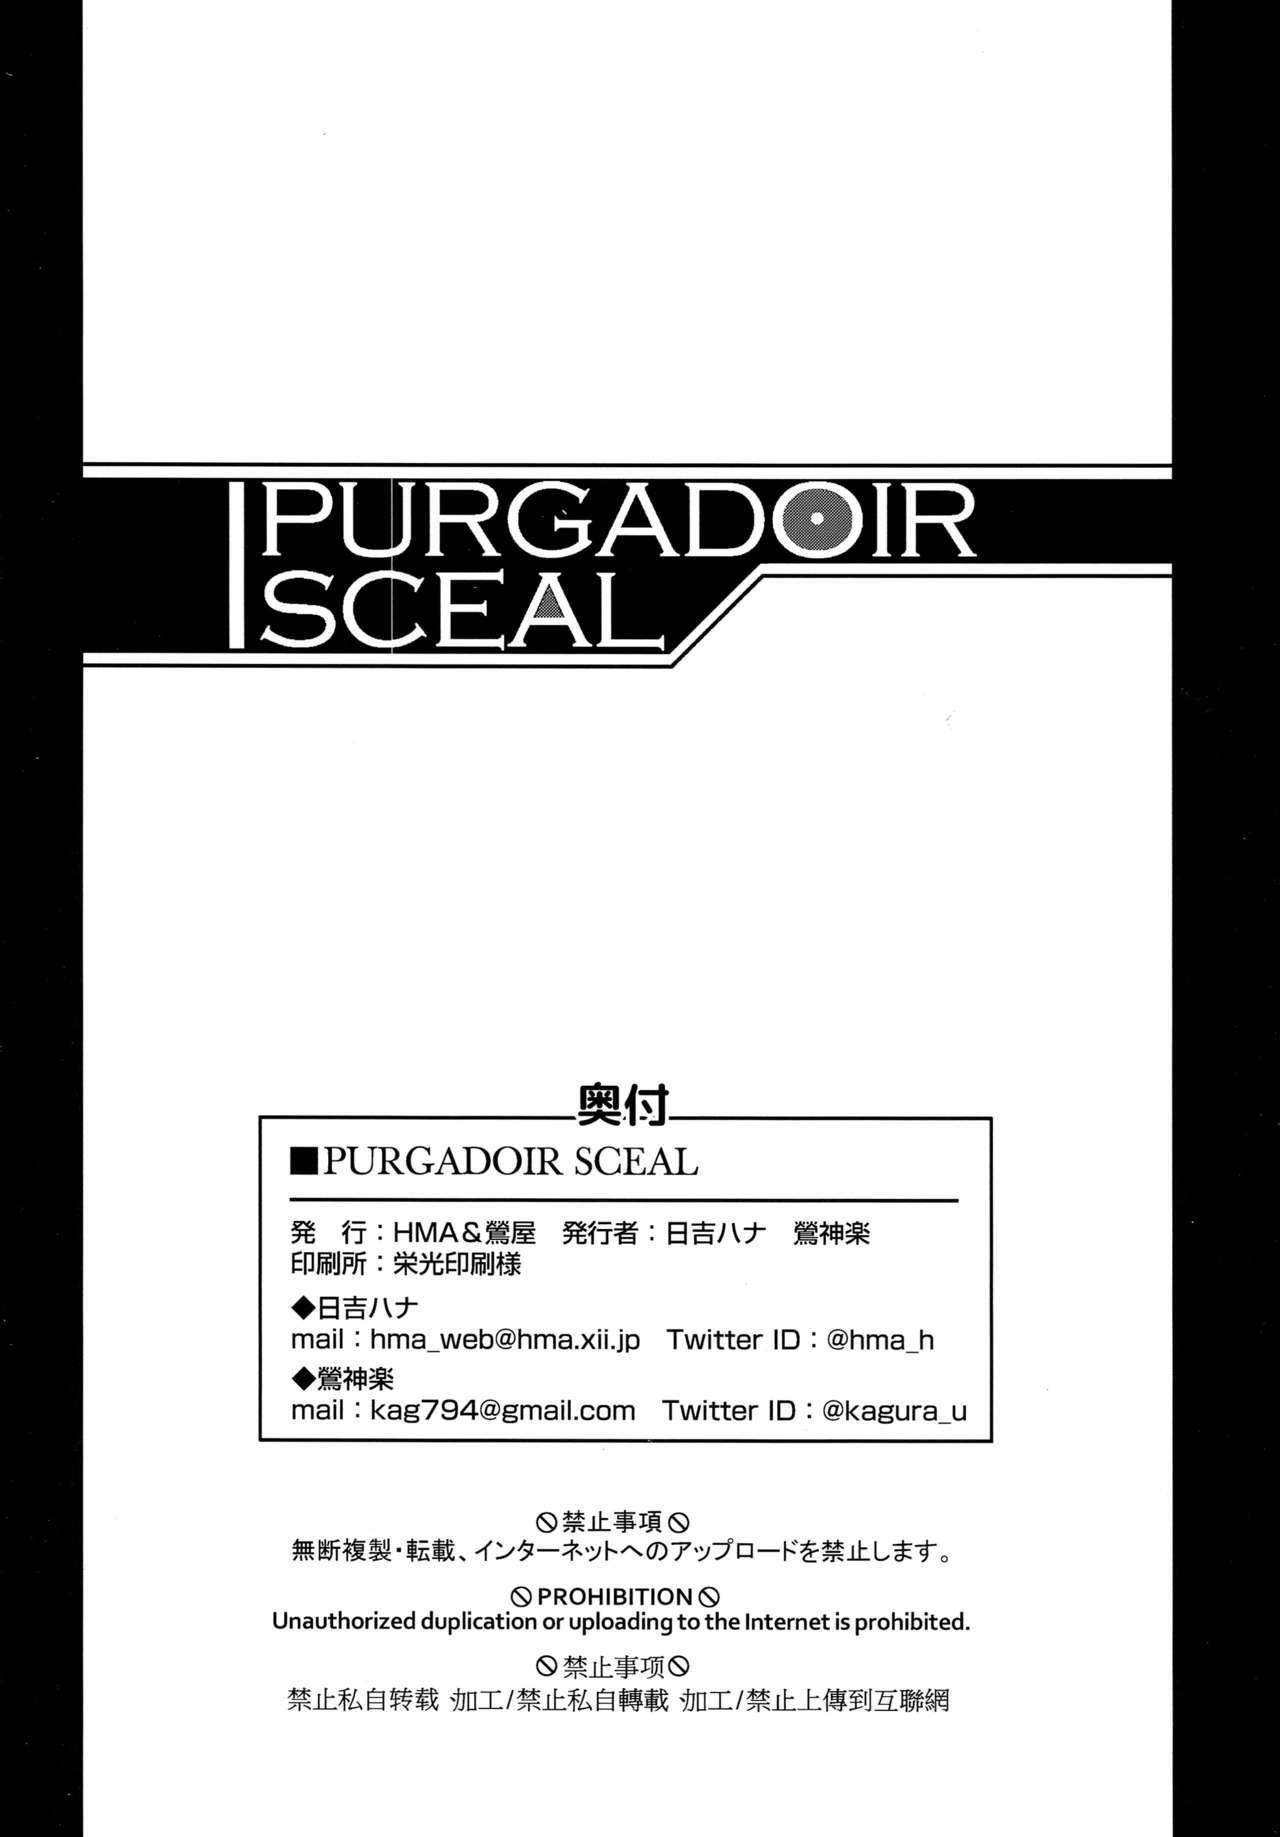 PURGADOIR SCEAL 24